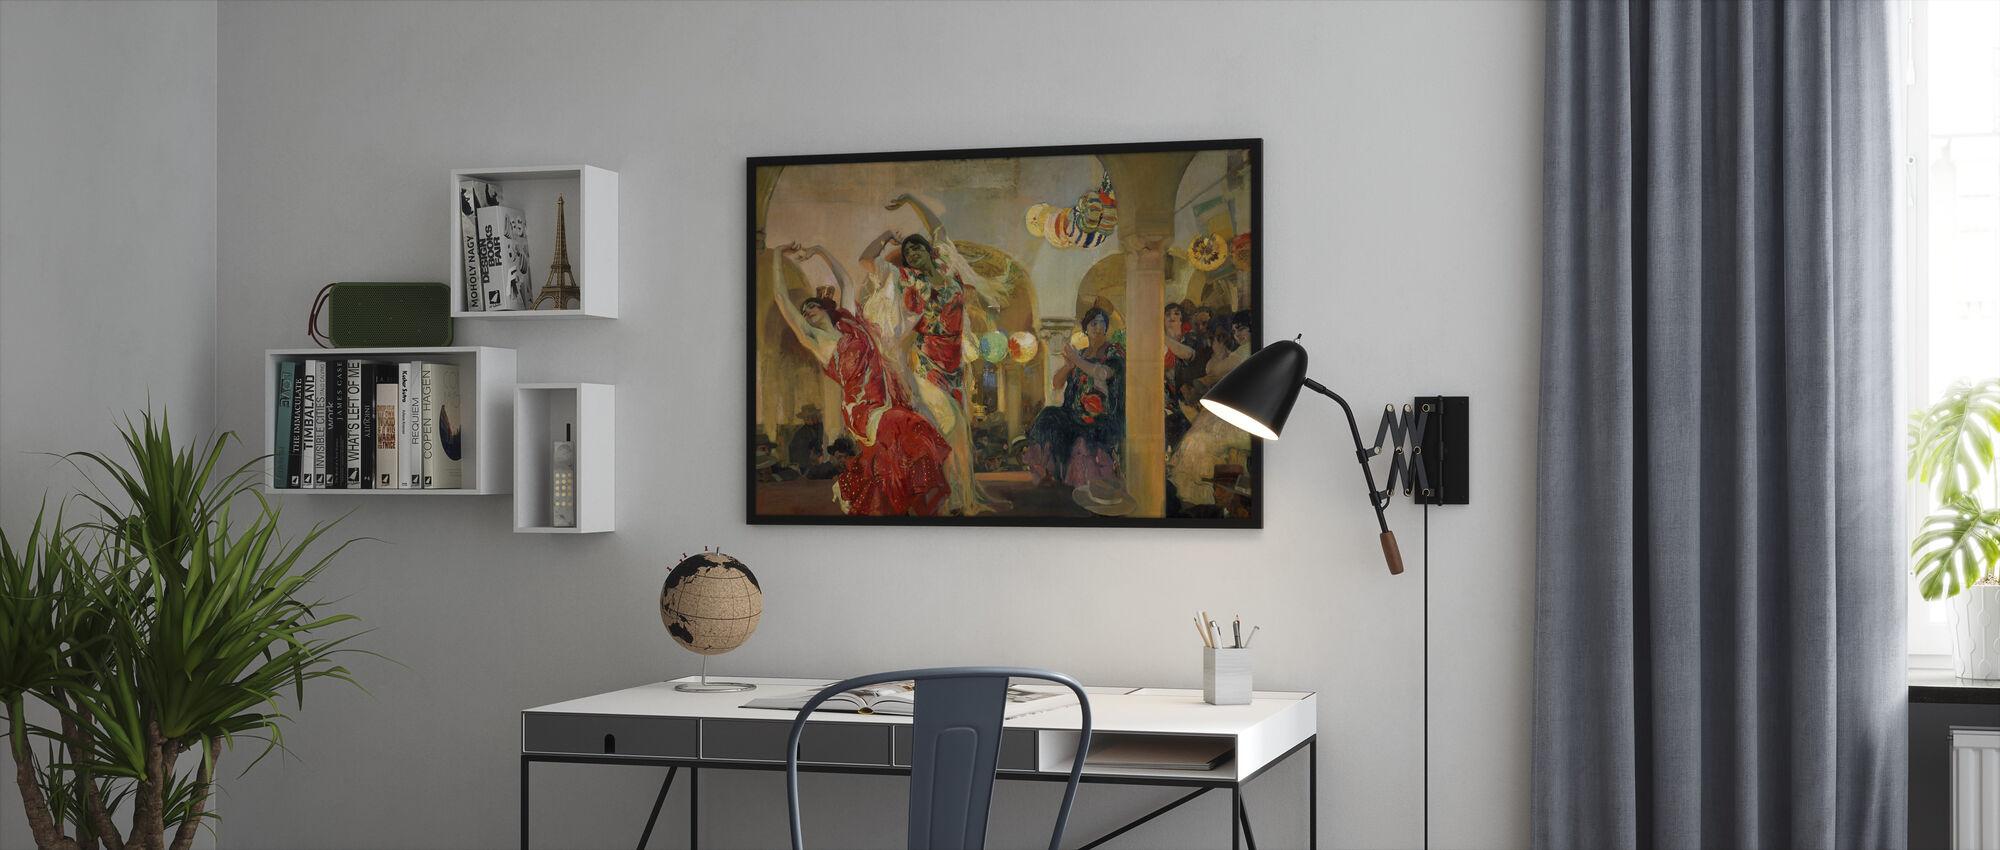 Women Dancing - Joaquin Sorolla - Framed print - Office